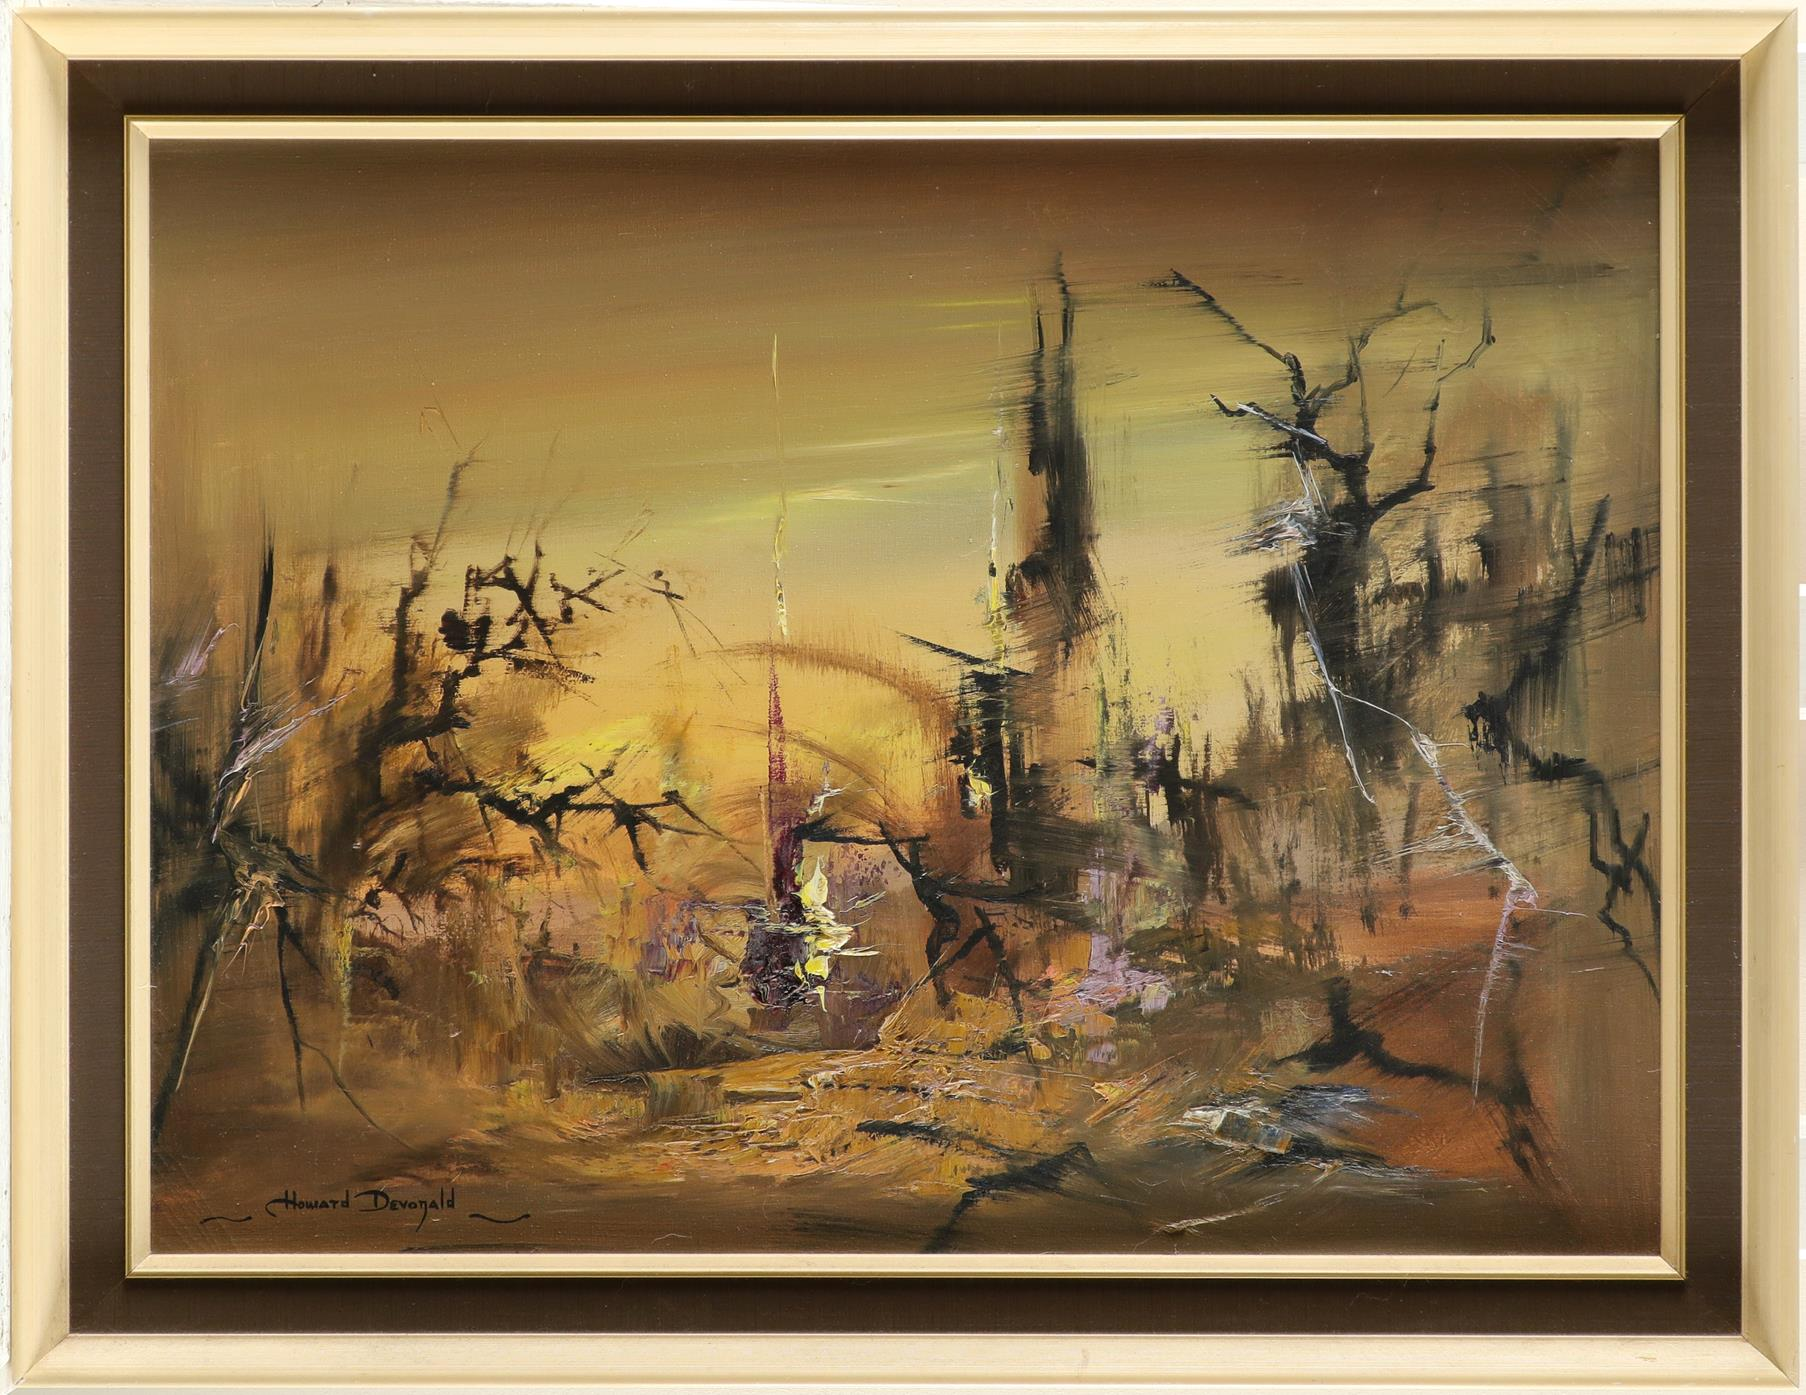 ‡Howard Devonald (20th Century) Landscape at dawn Signed Howard Devonald (lower left) Oil on - Image 2 of 3